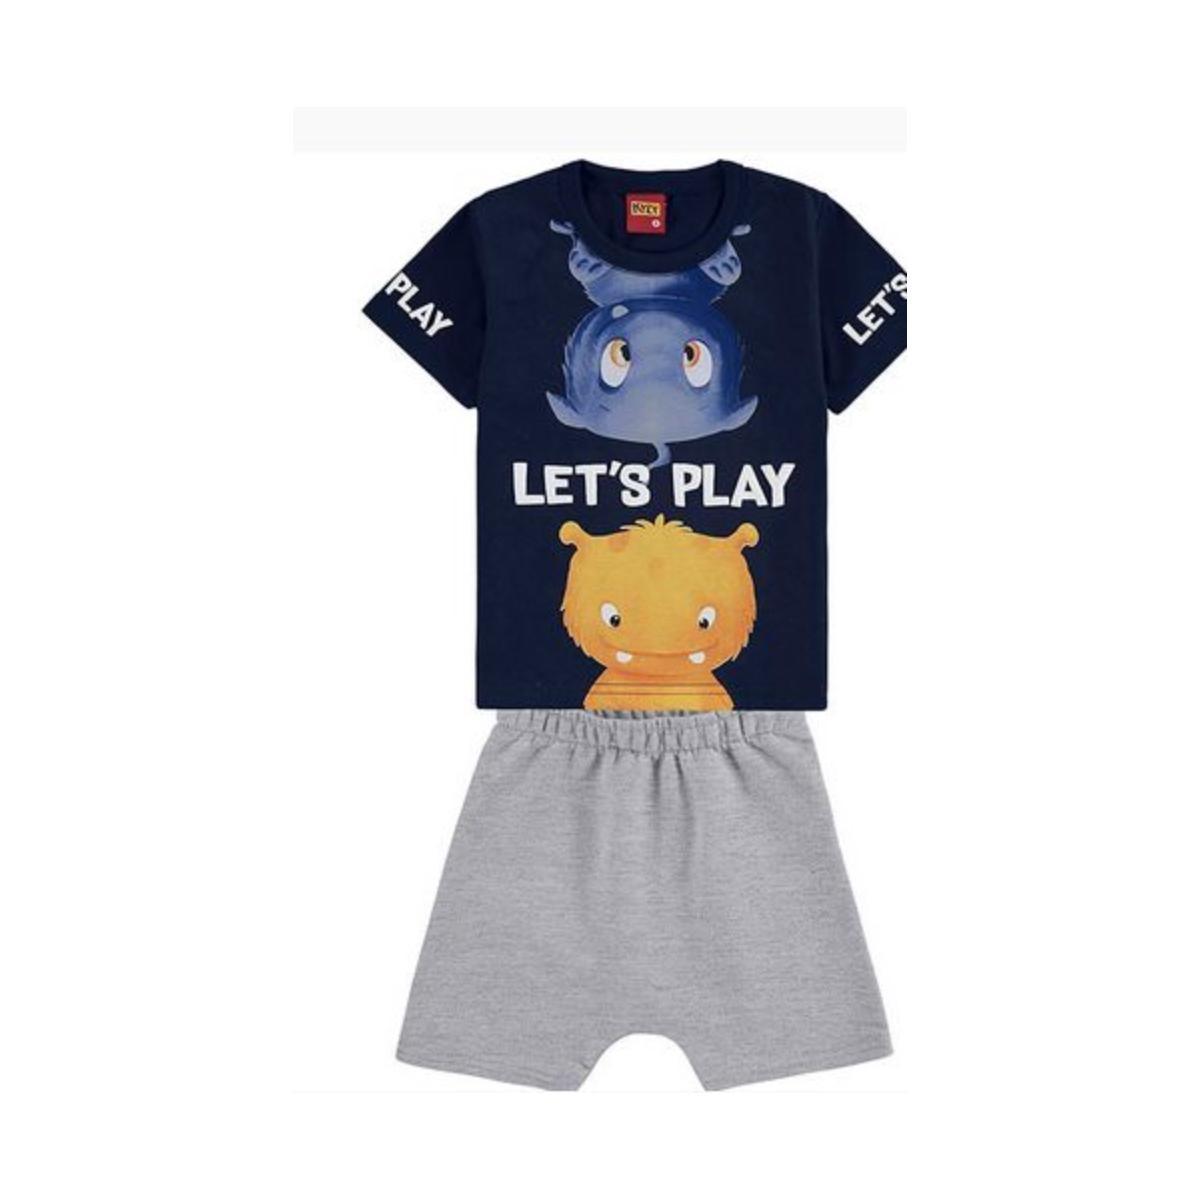 Conjunto infantil masculino - Kyly- 110951